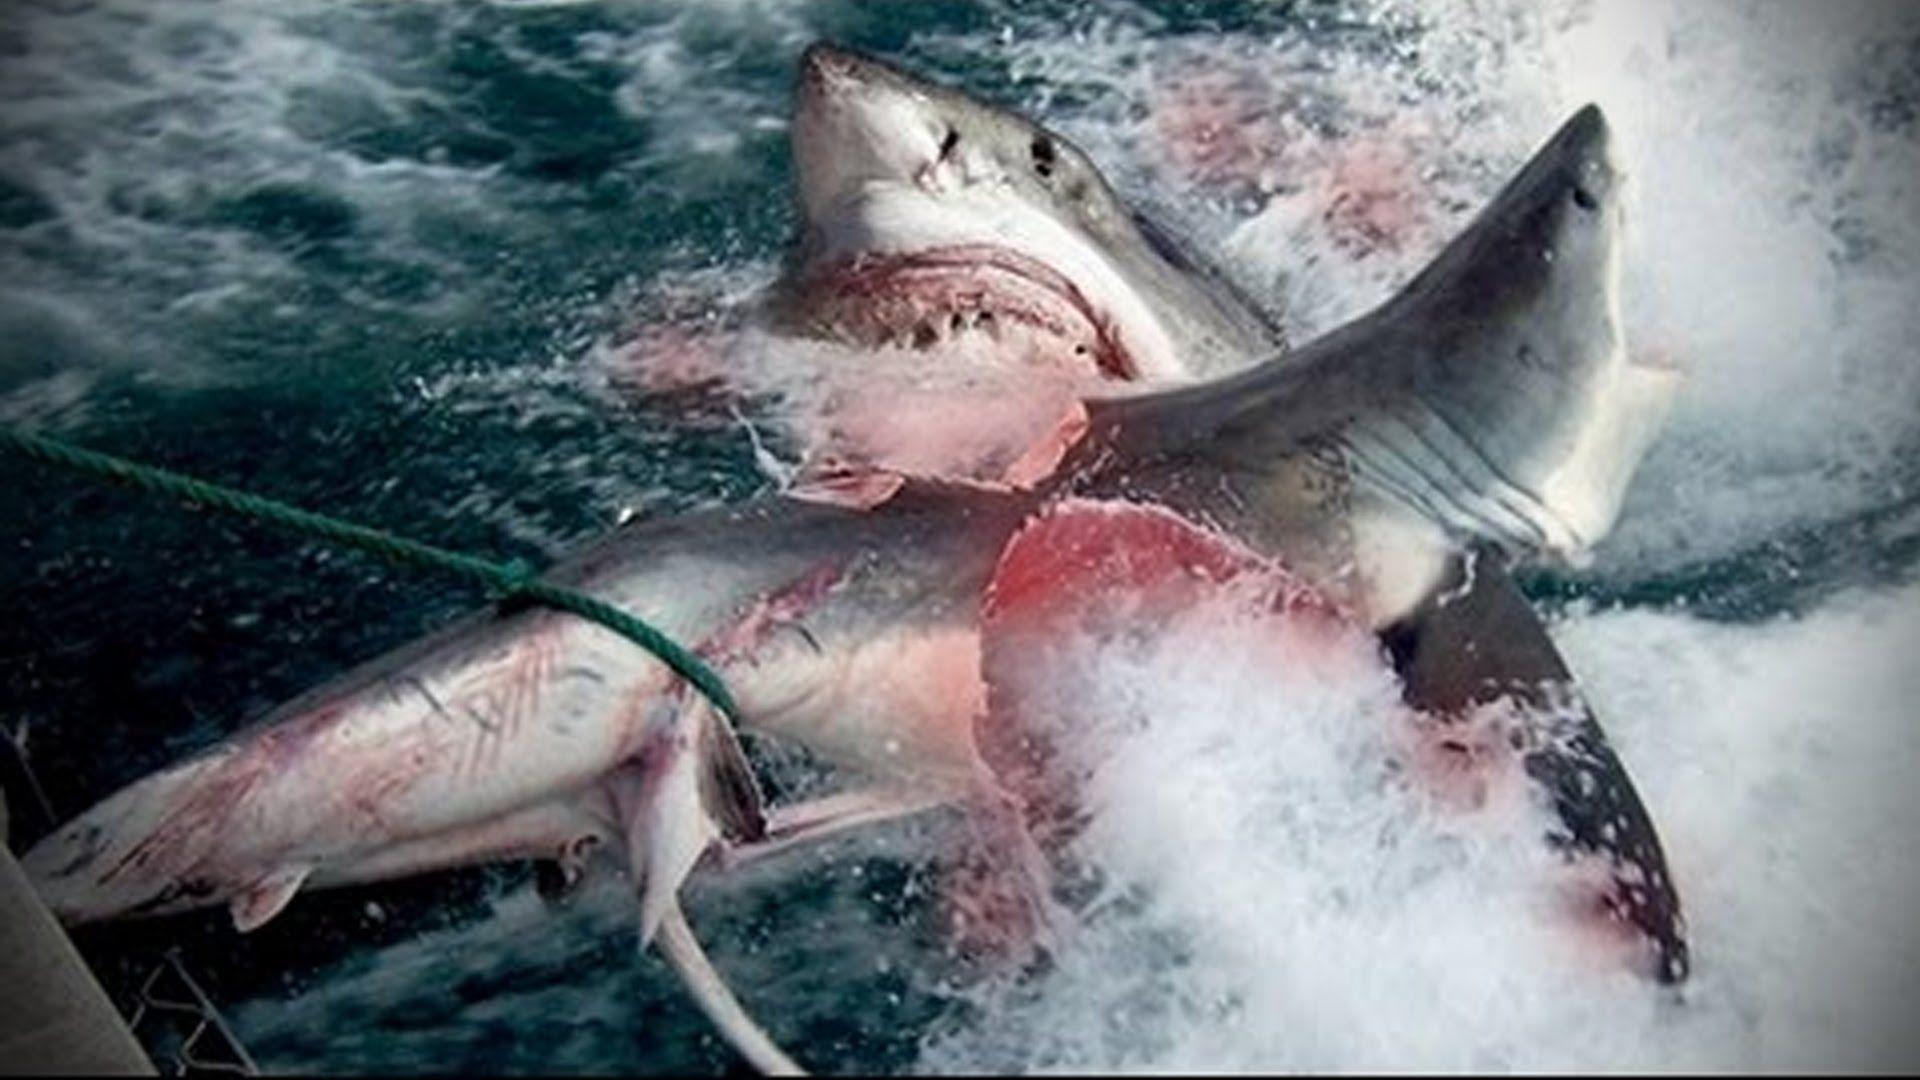 Megalodon Shark Caught on Tape, UFO and Alien Sightings ...